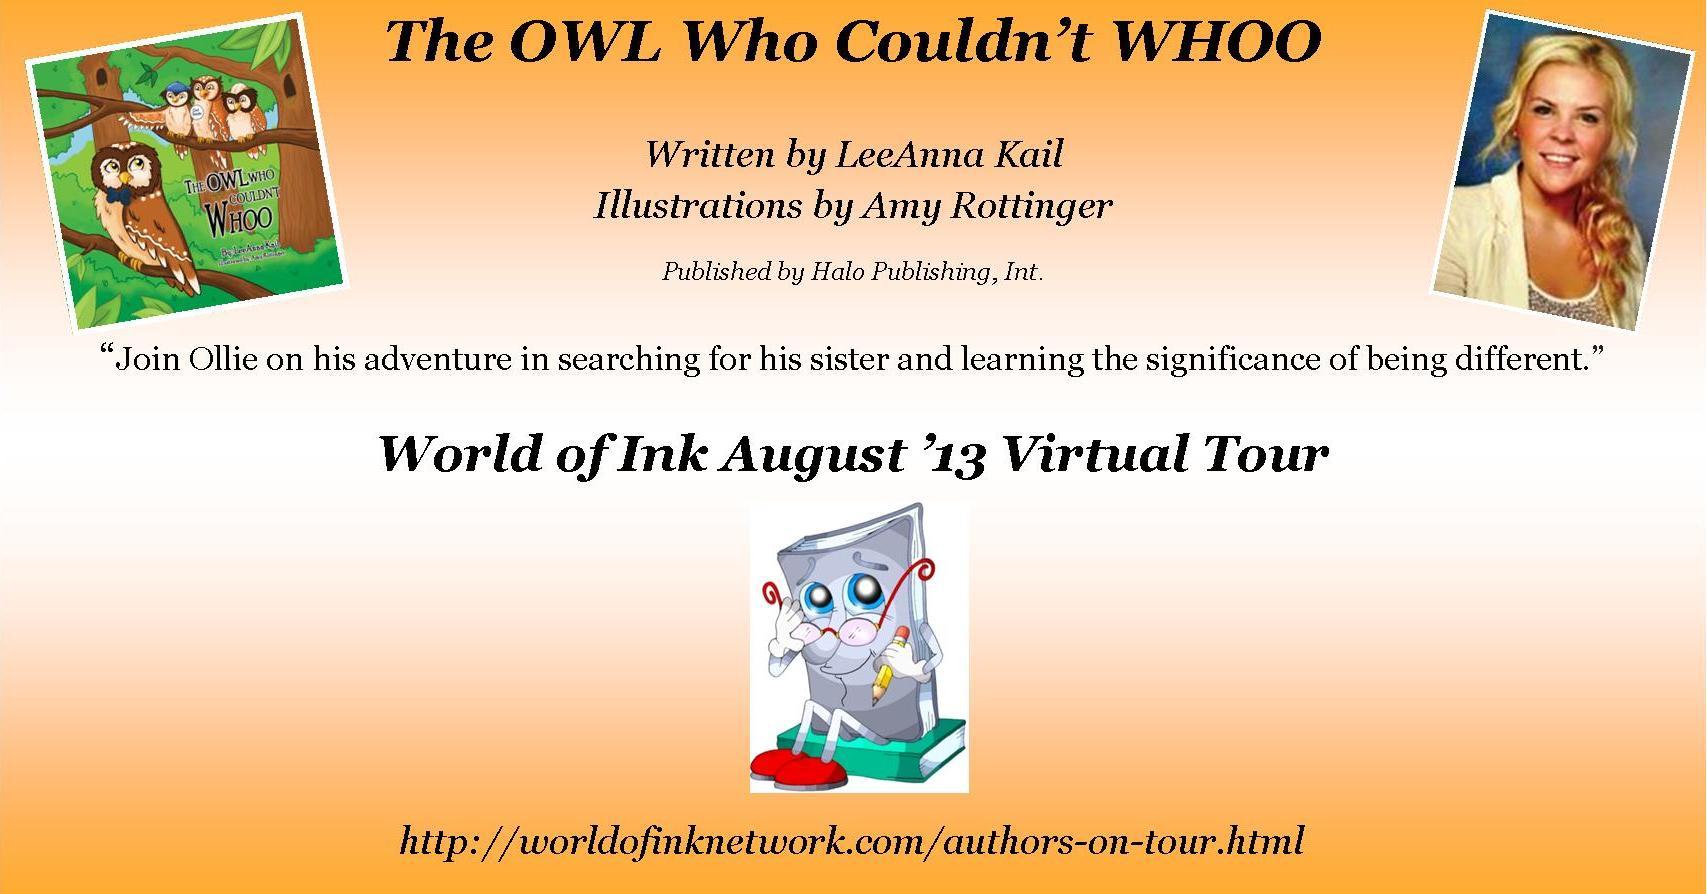 http://storiesforchildren.tripod.com/worldofinknetwork/leanna-kail-aug-13.html